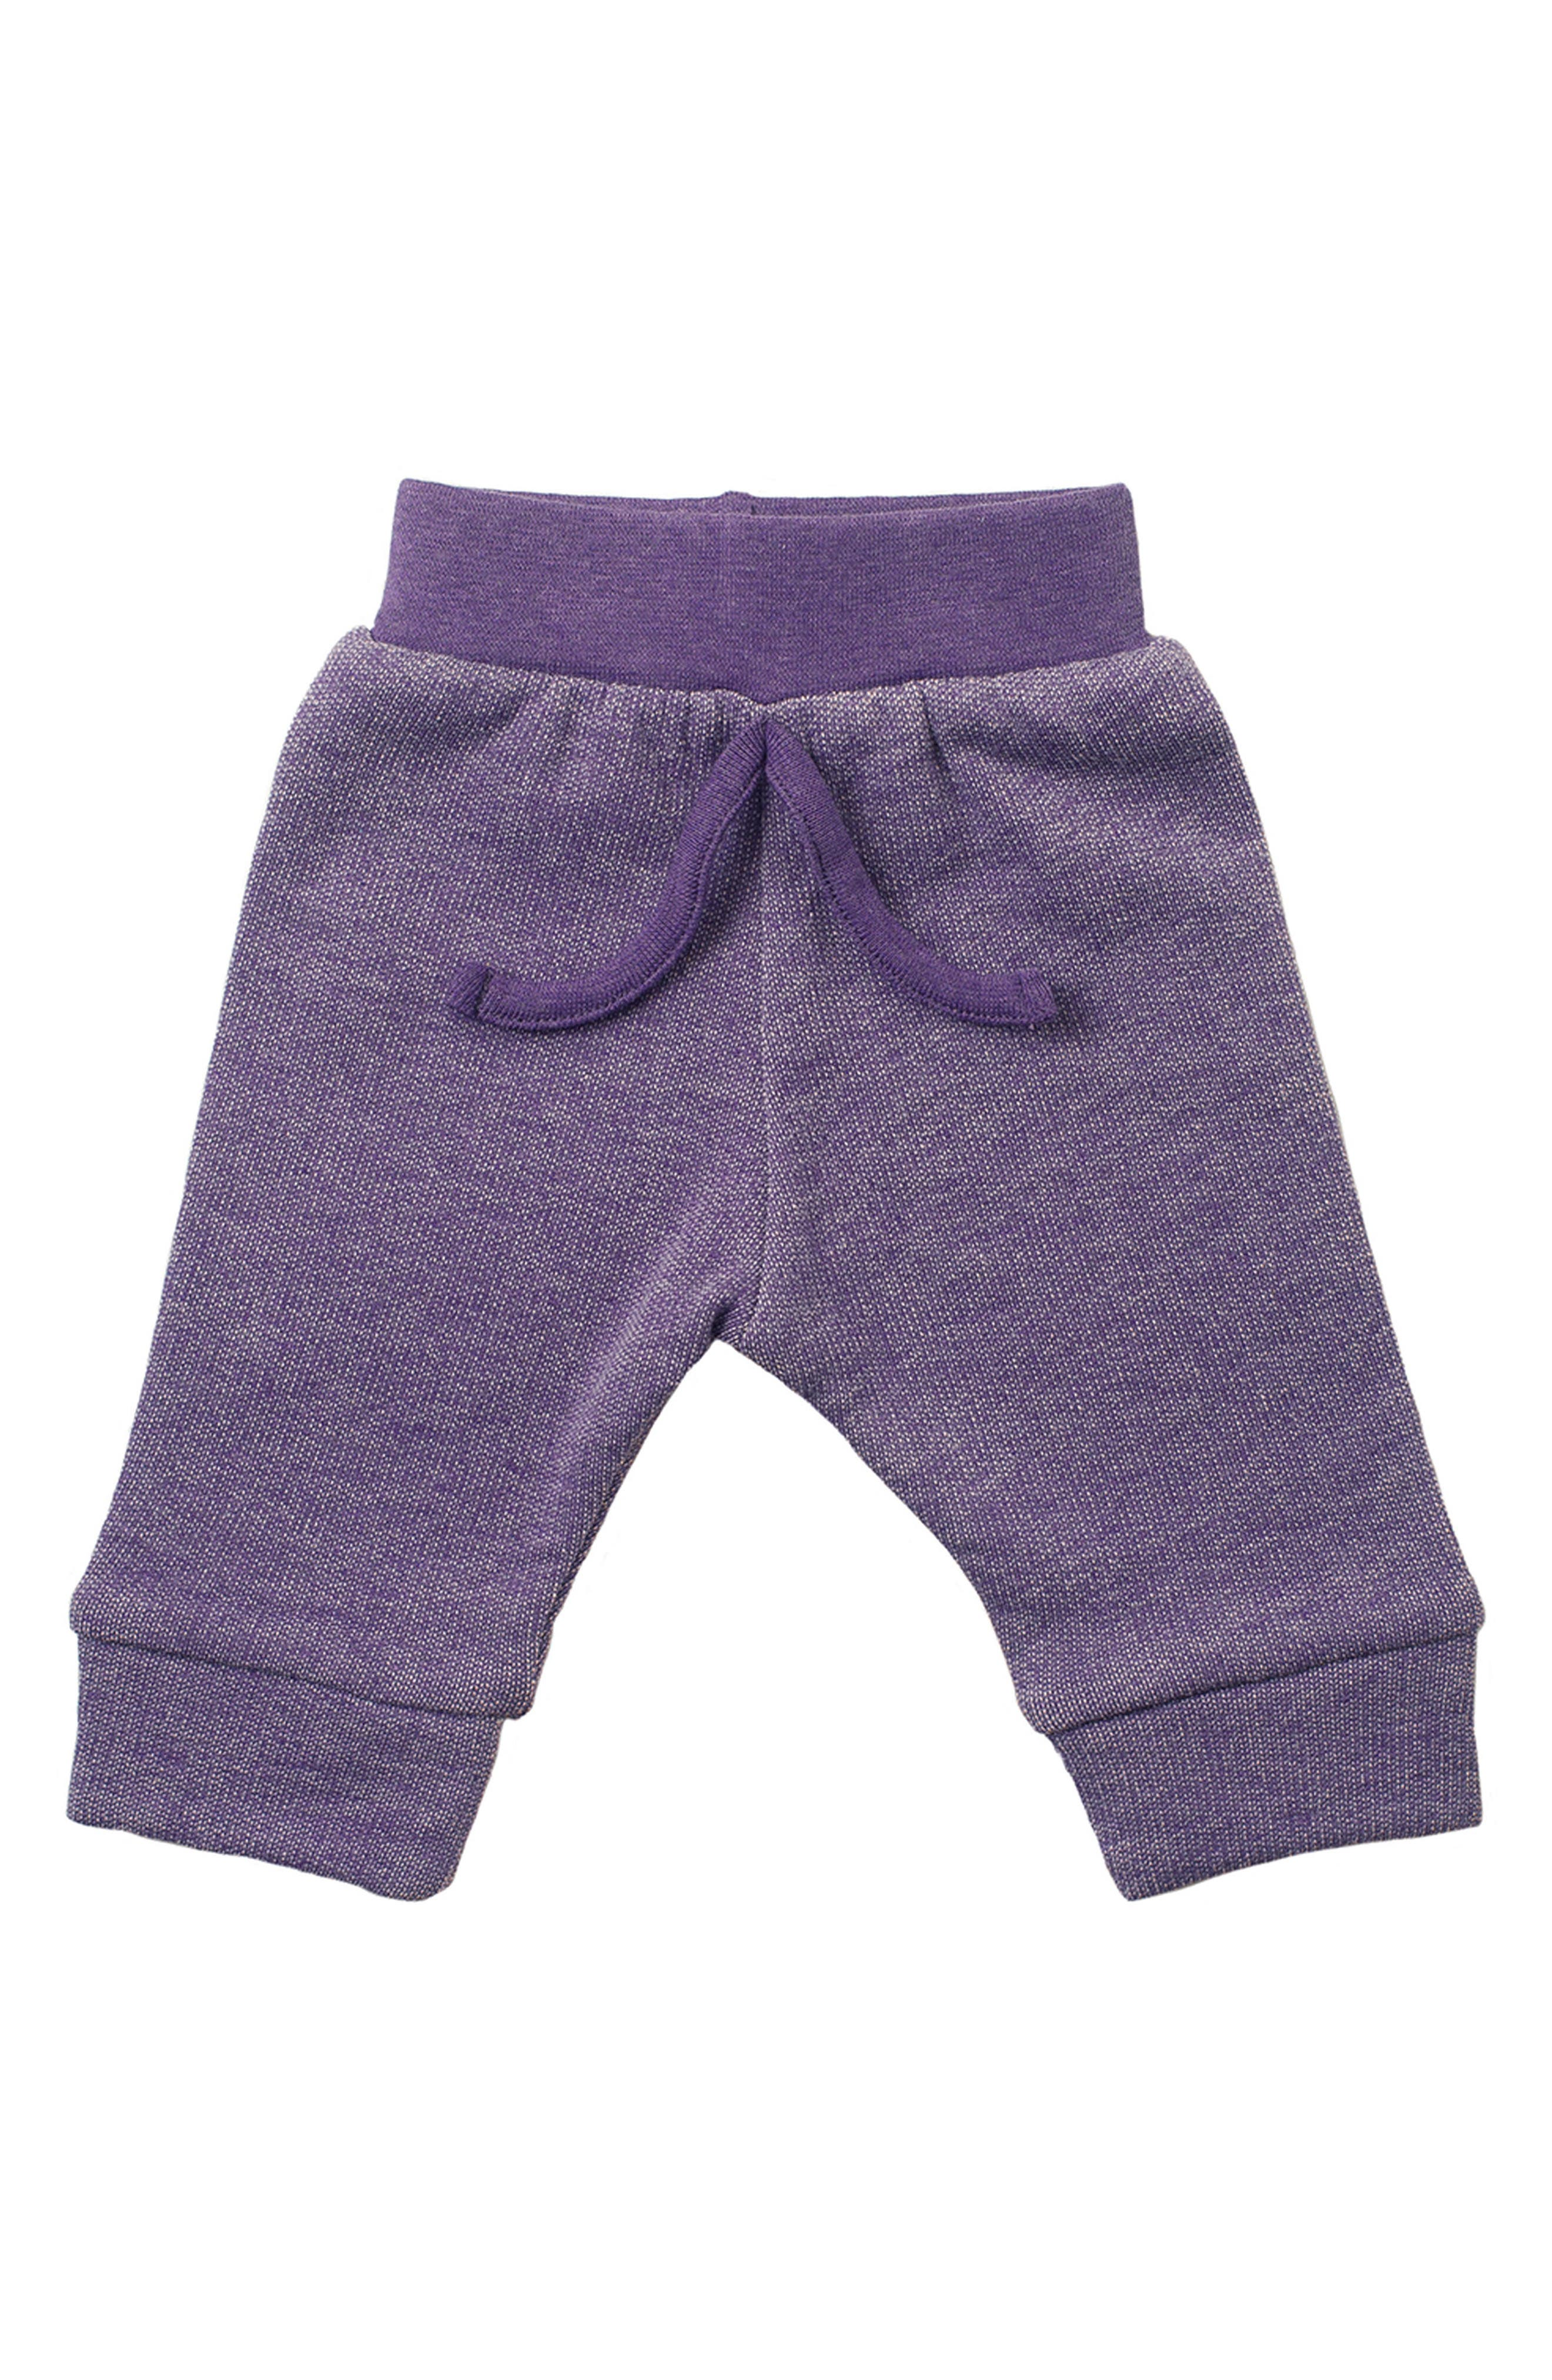 Alternate Image 1 Selected - Monica + Andy Organic Cotton Sweatpants (Baby Girls)